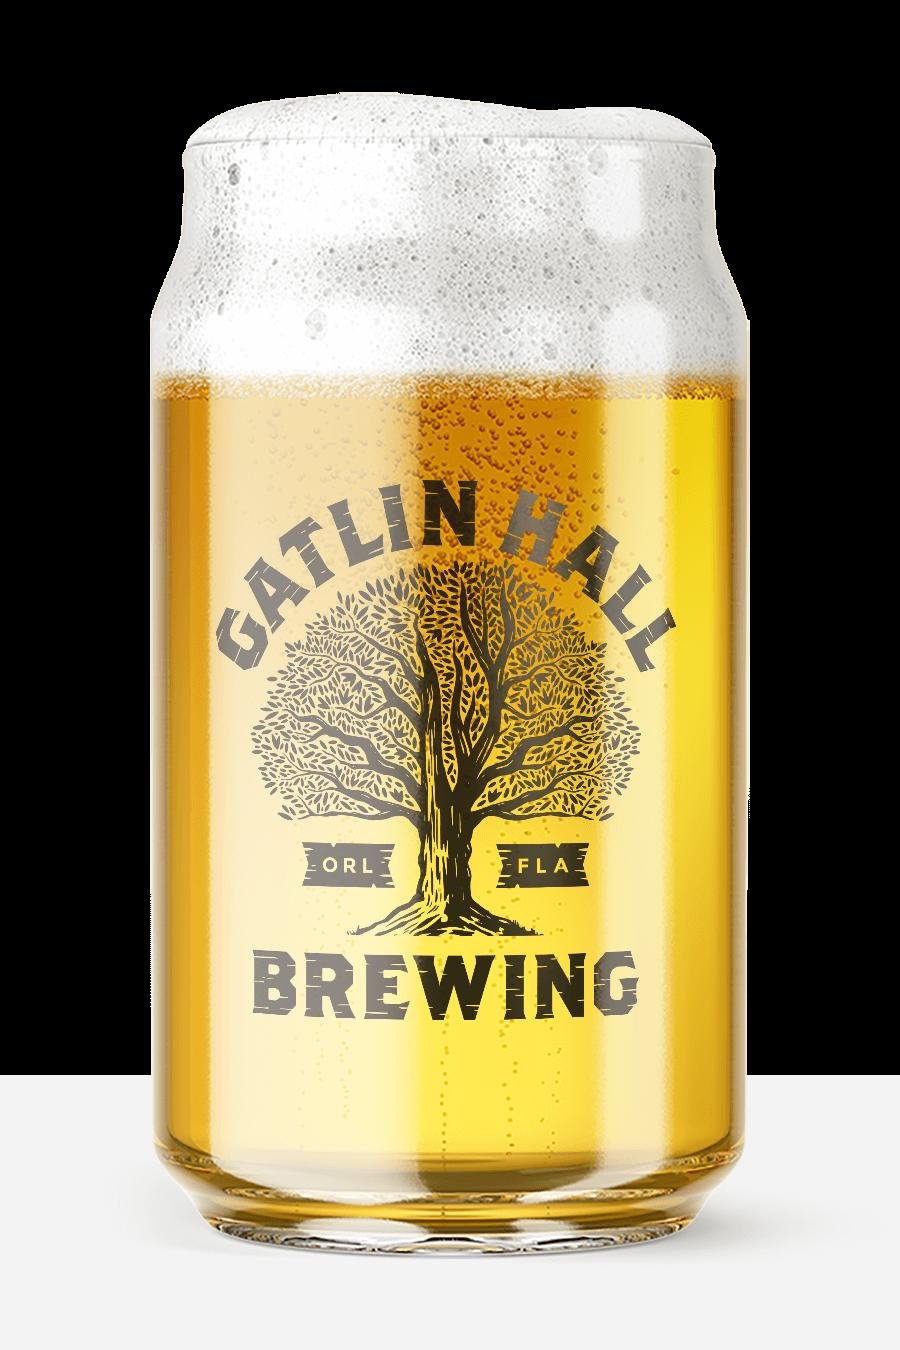 Gatlin Hall beer glass